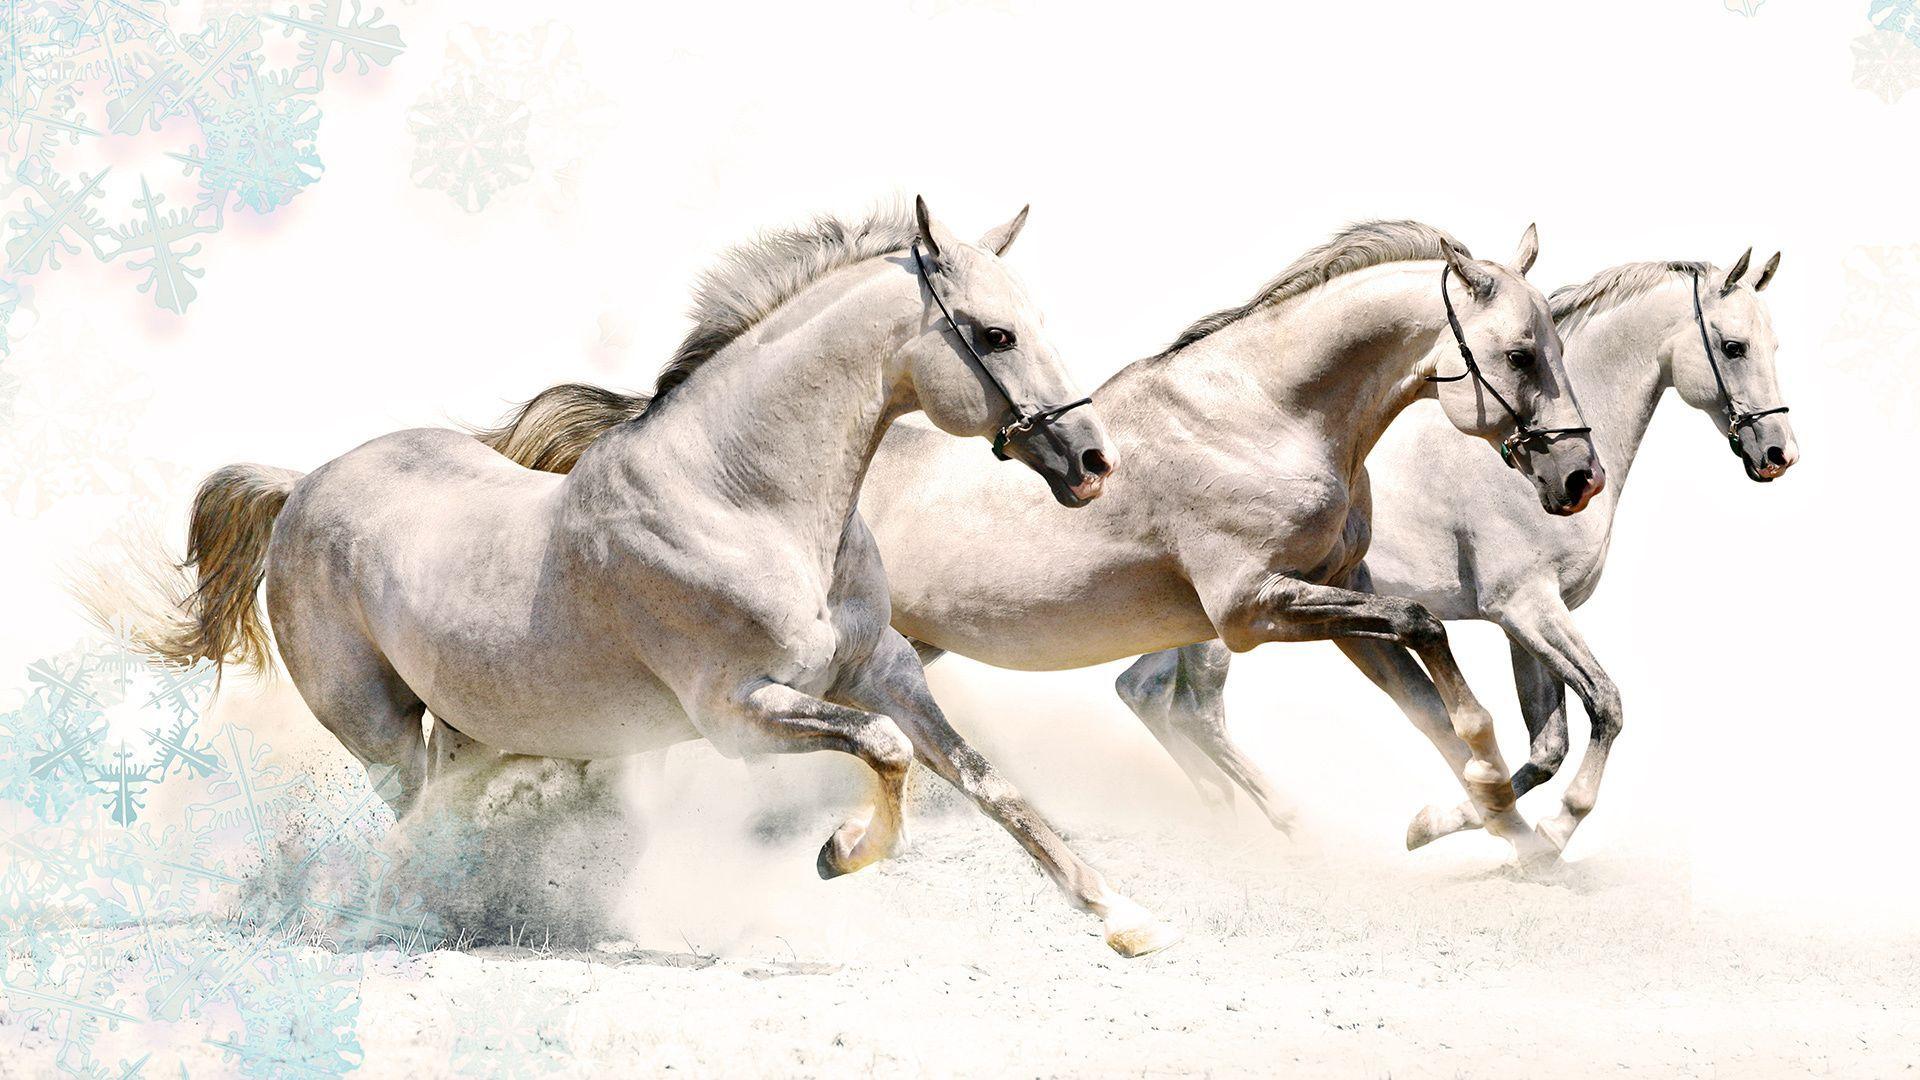 Running Horses Wallpaper Desktop Horses Run Horse Large Hd Horse Wallpaper Horses White Horses